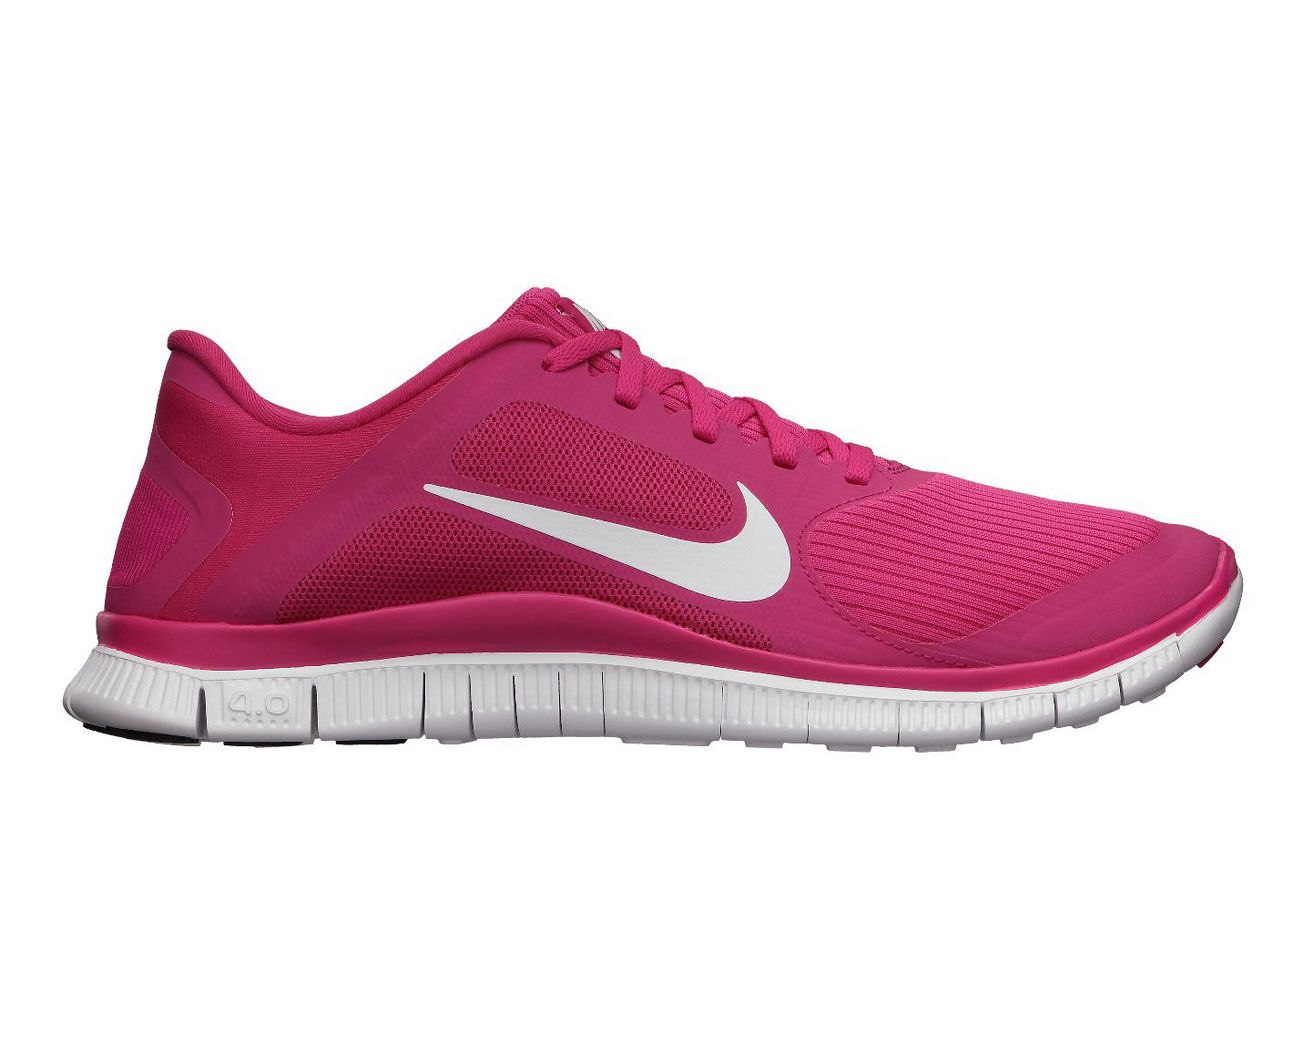 Rrs Products Nik1533 Womens Nike Free 40 V3 Nike Free 4.0 V3 Women